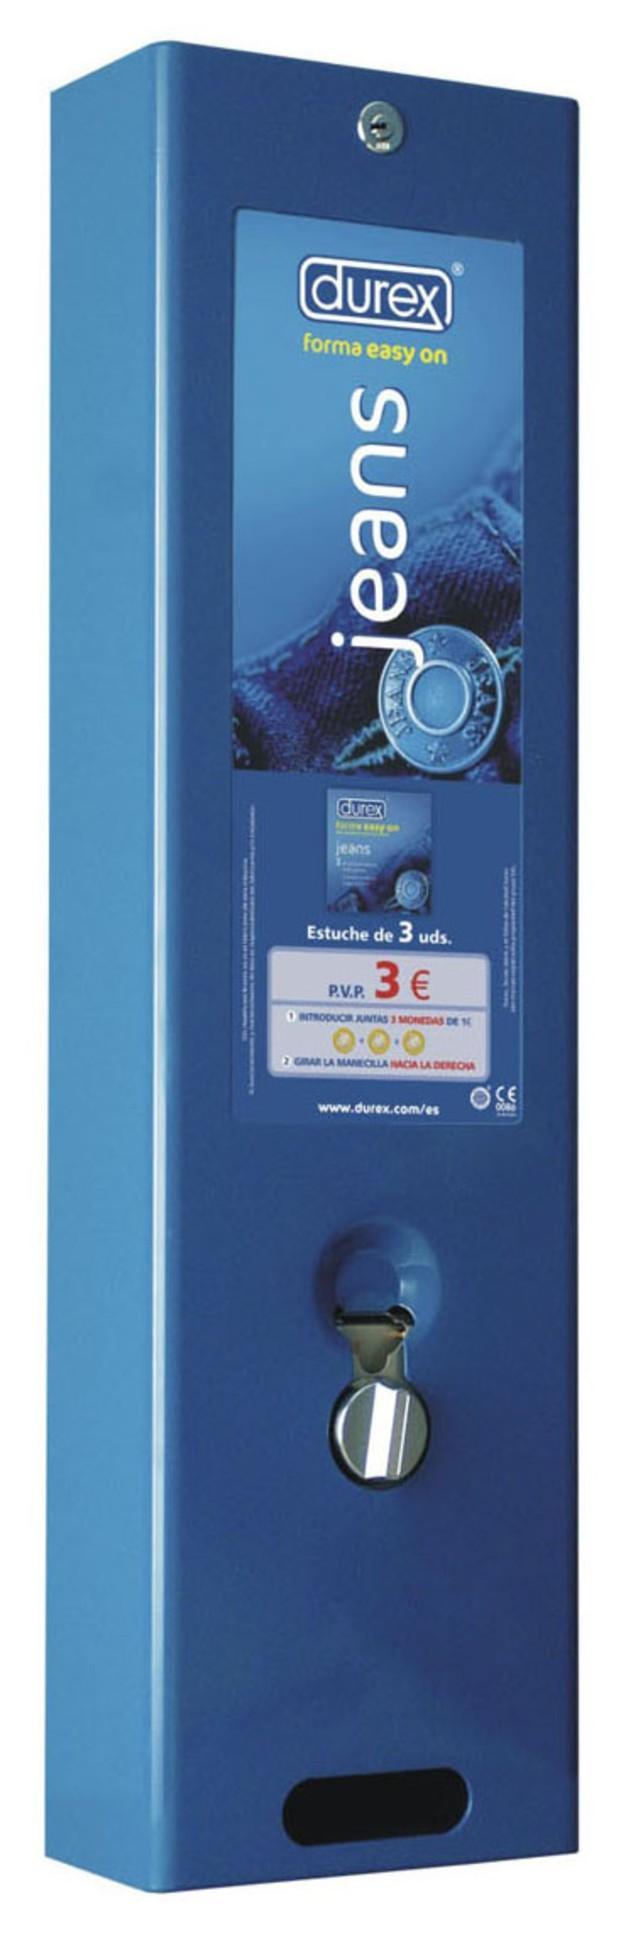 Máquina preservativo. Máquina de preservativos Durex